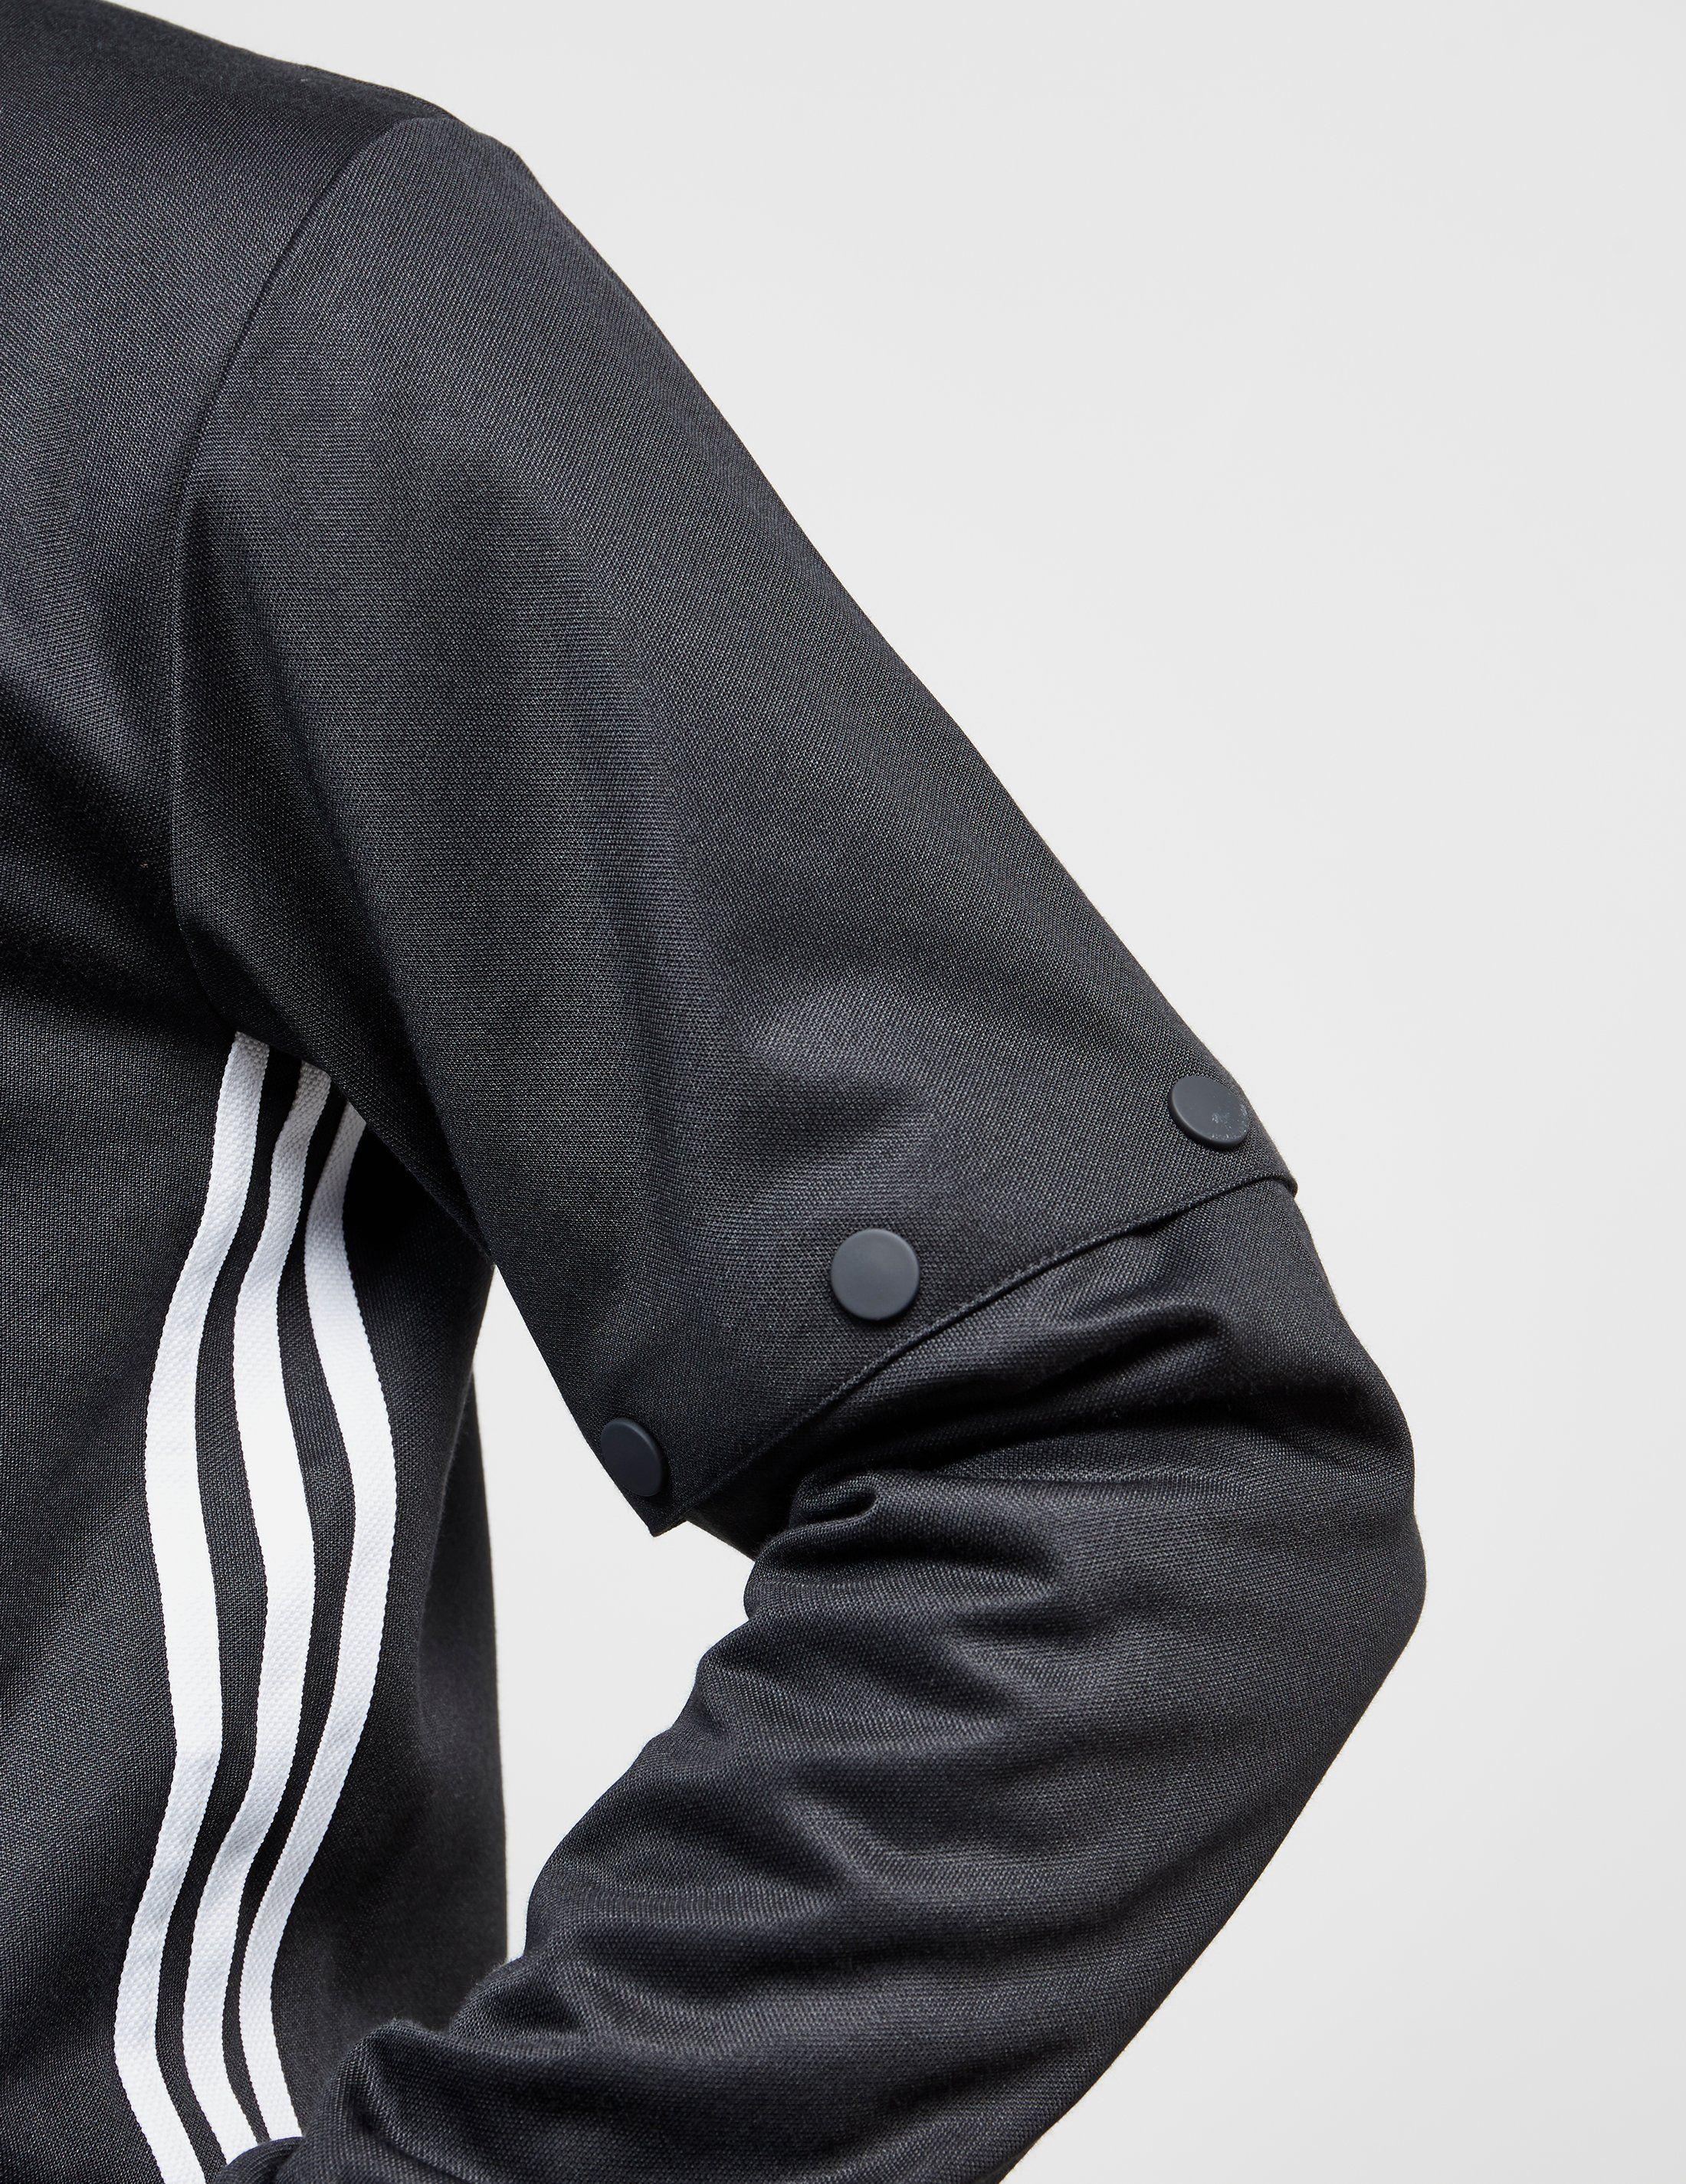 adidas Originals Trefoil Snap Track Top